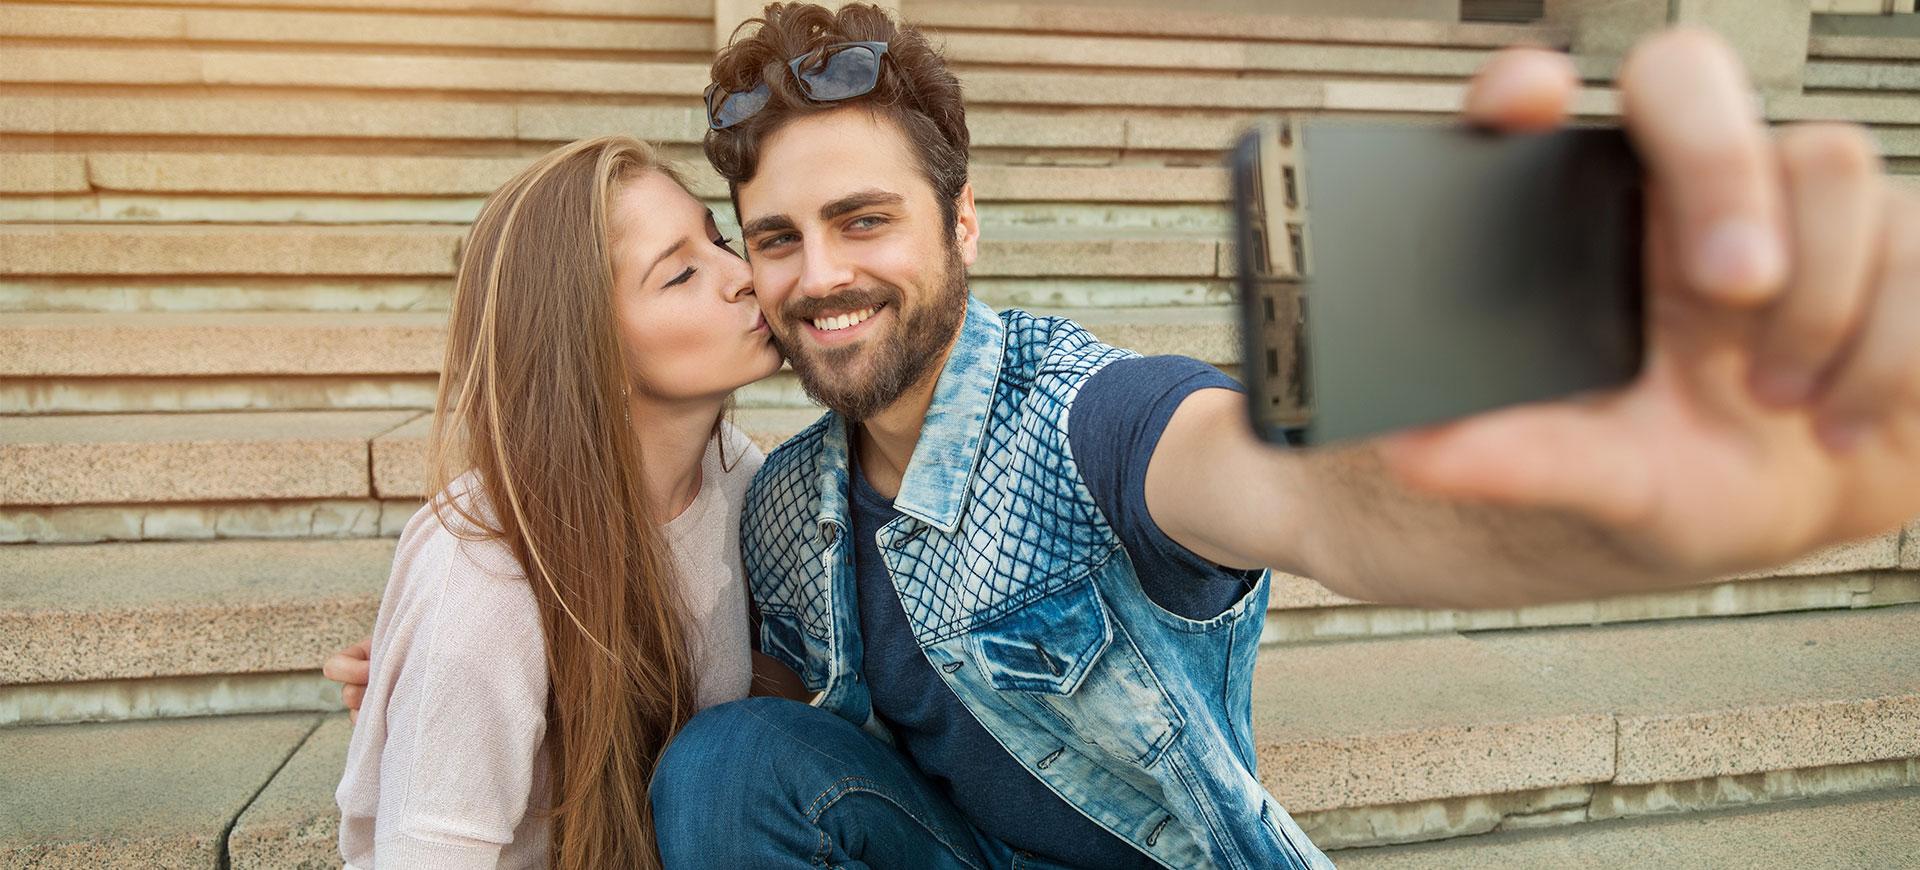 undvikande dating orolig